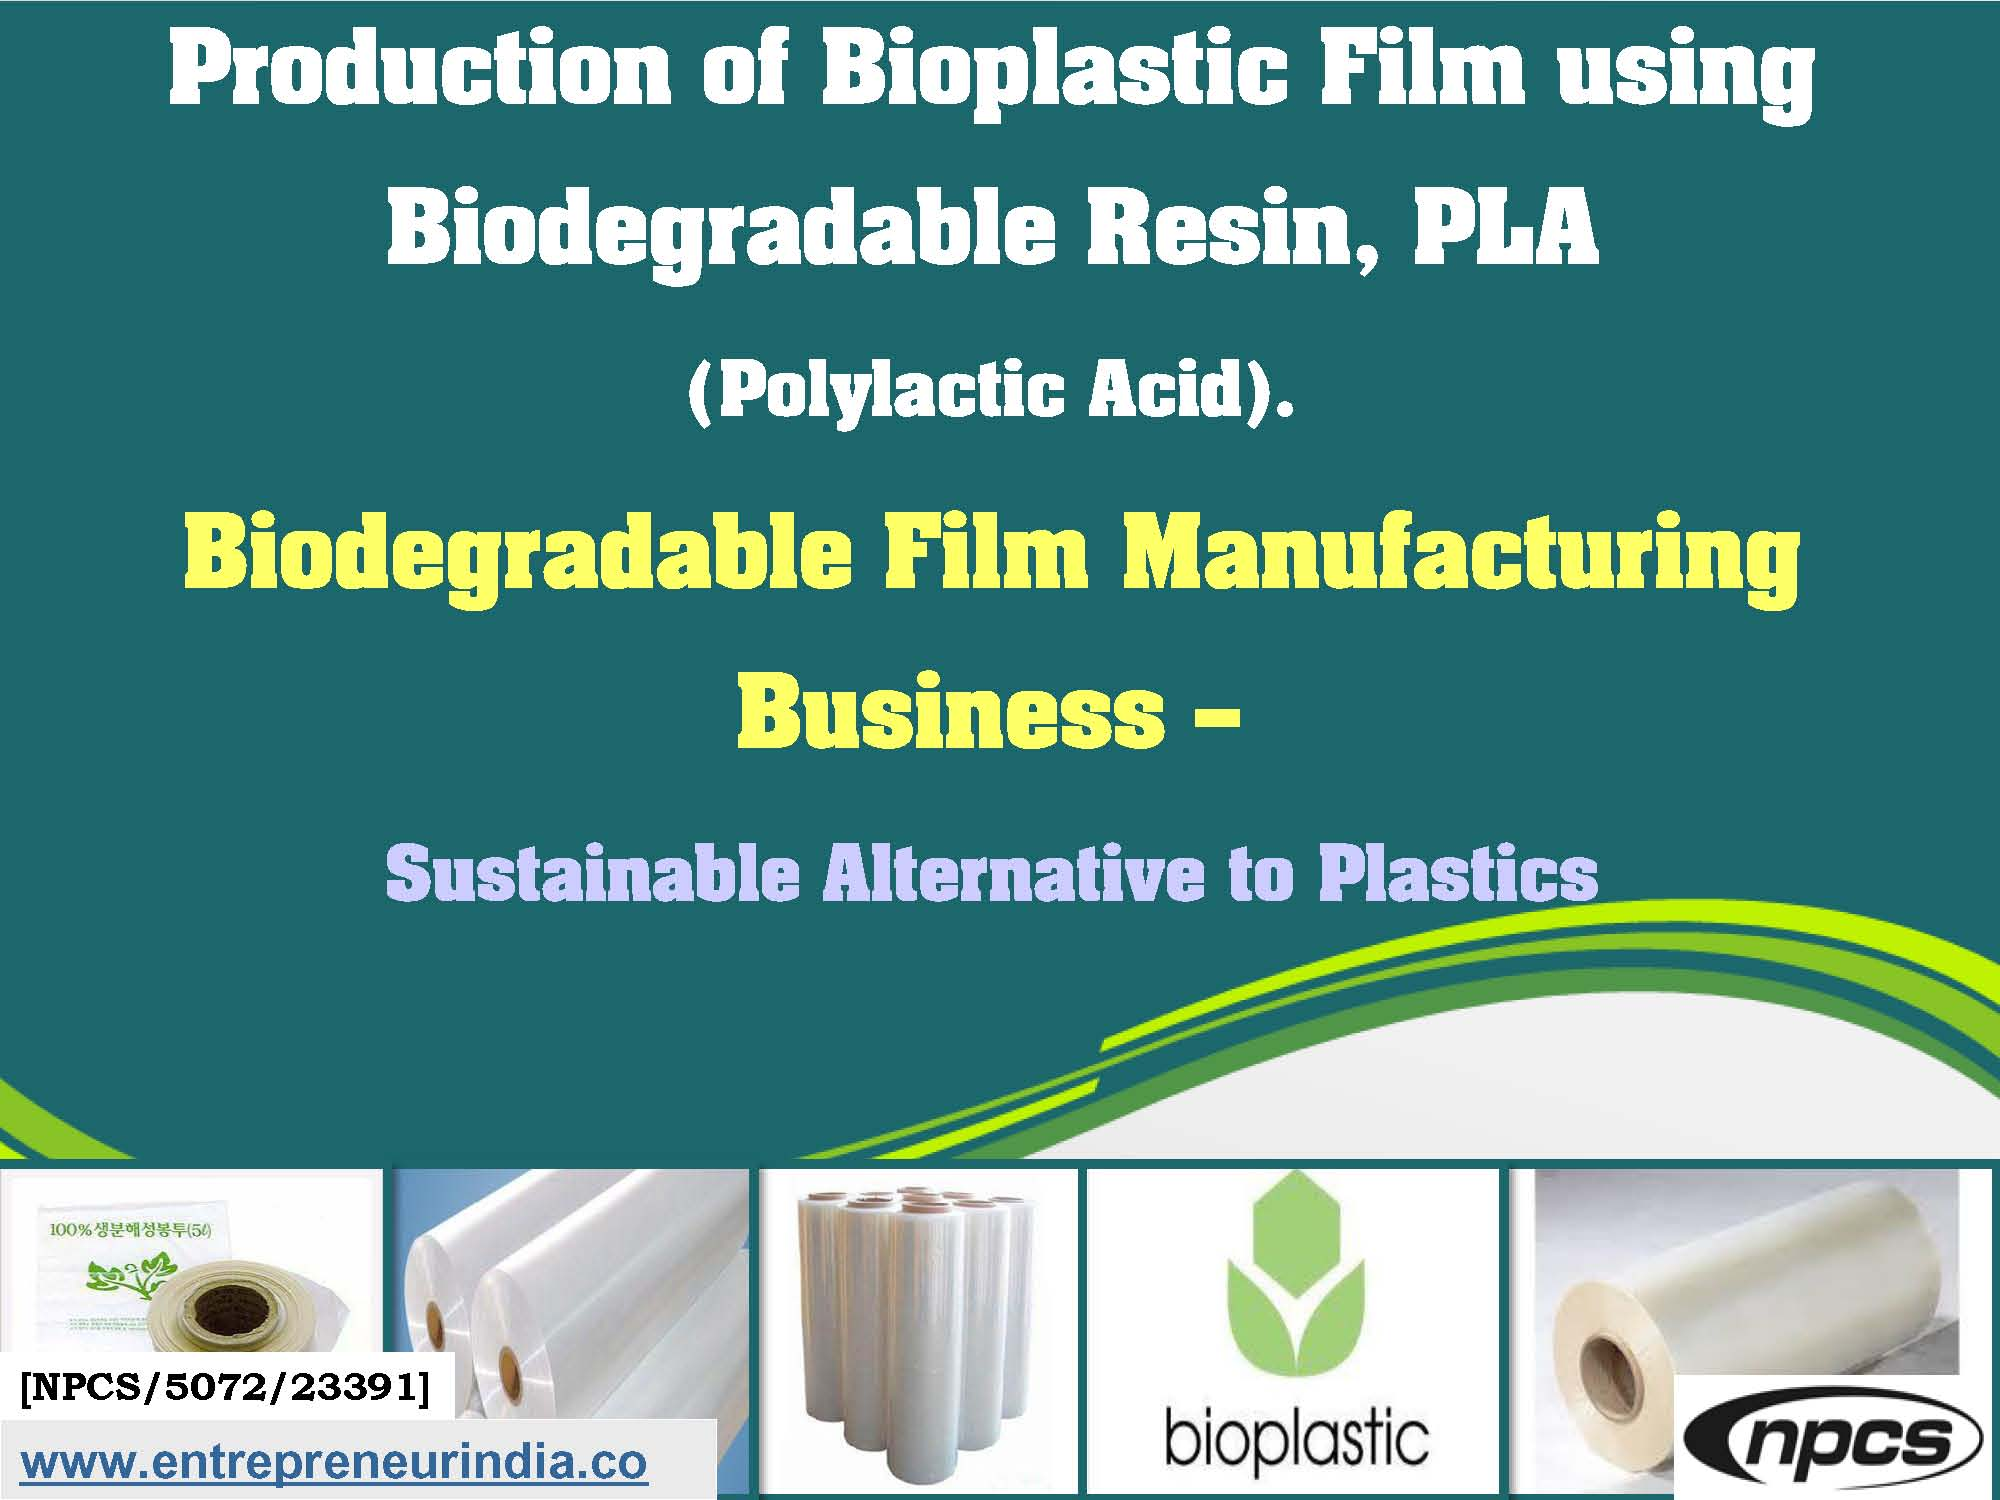 Production of Bioplastic Film using Biodegradable Resin, PLA